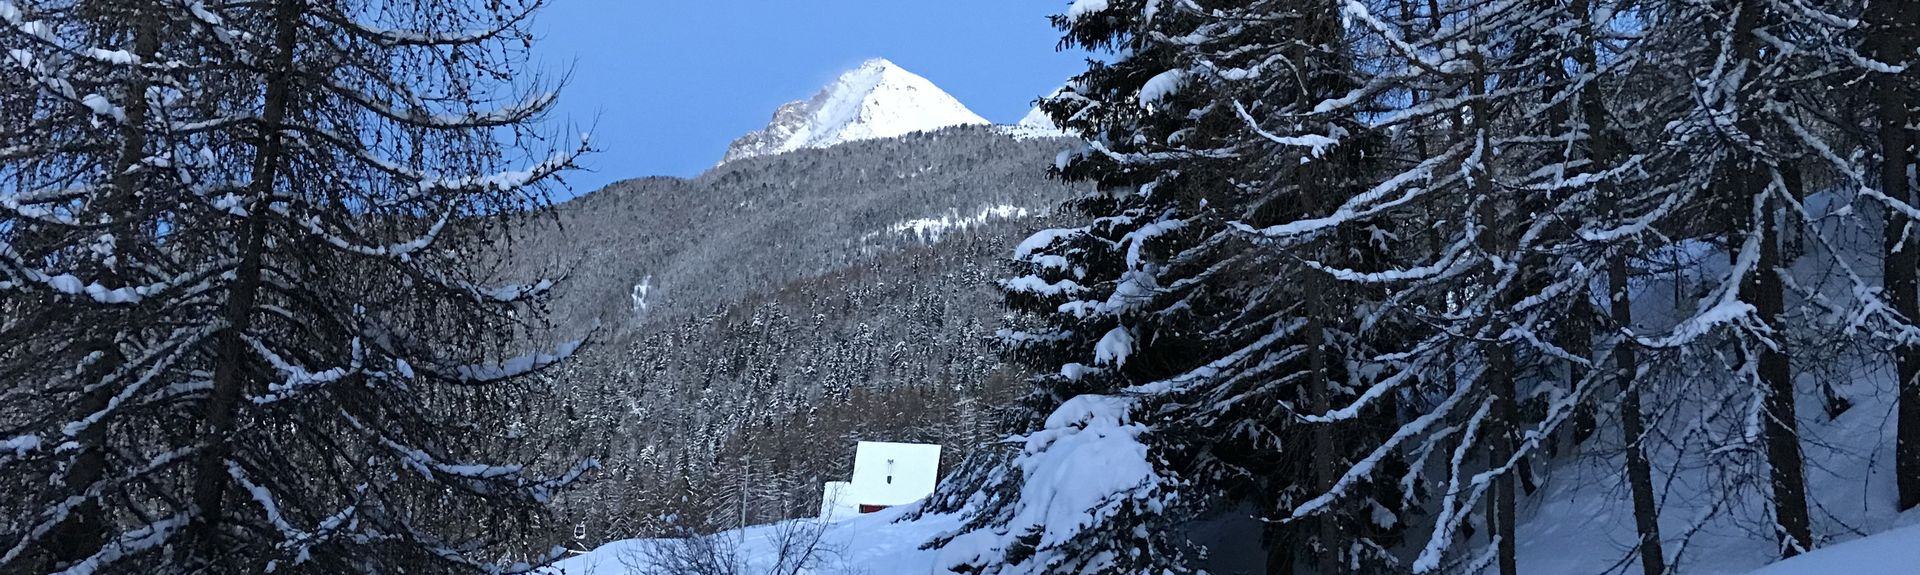 Valpelline, Valle d'Aosta, Włochy